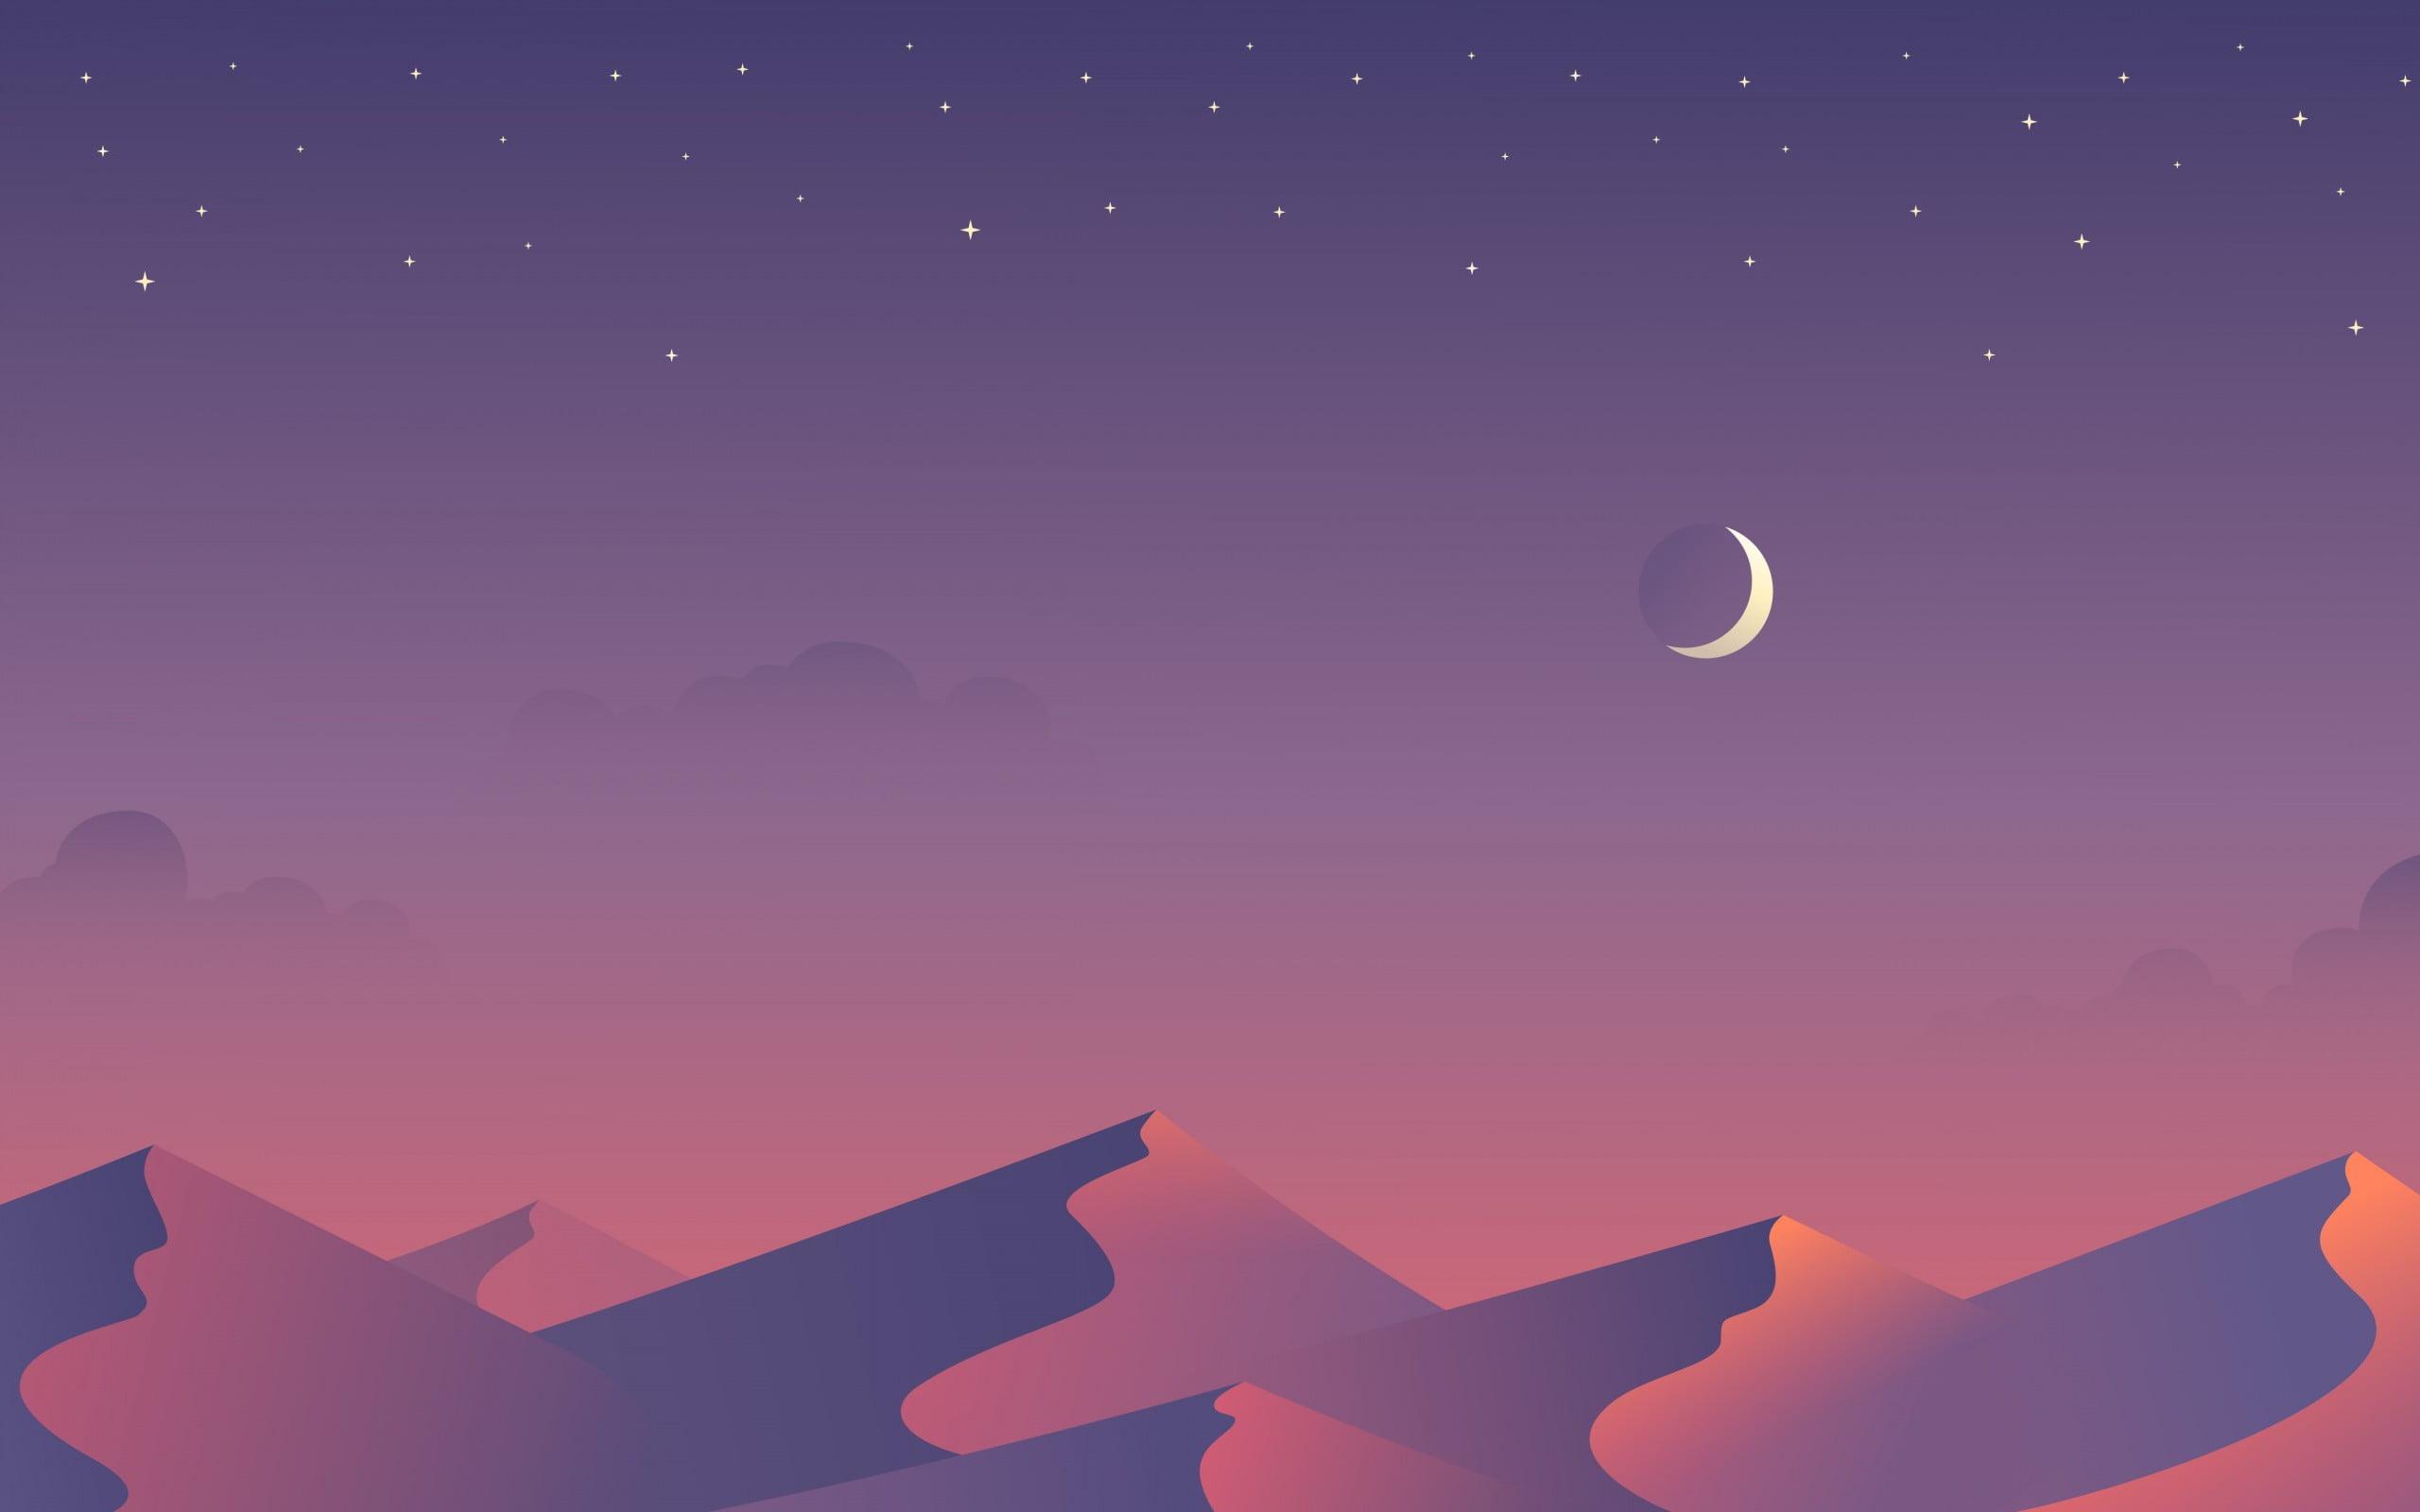 Night Illustration HD Wallpapers   Top Night Illustration HD 2560x1600